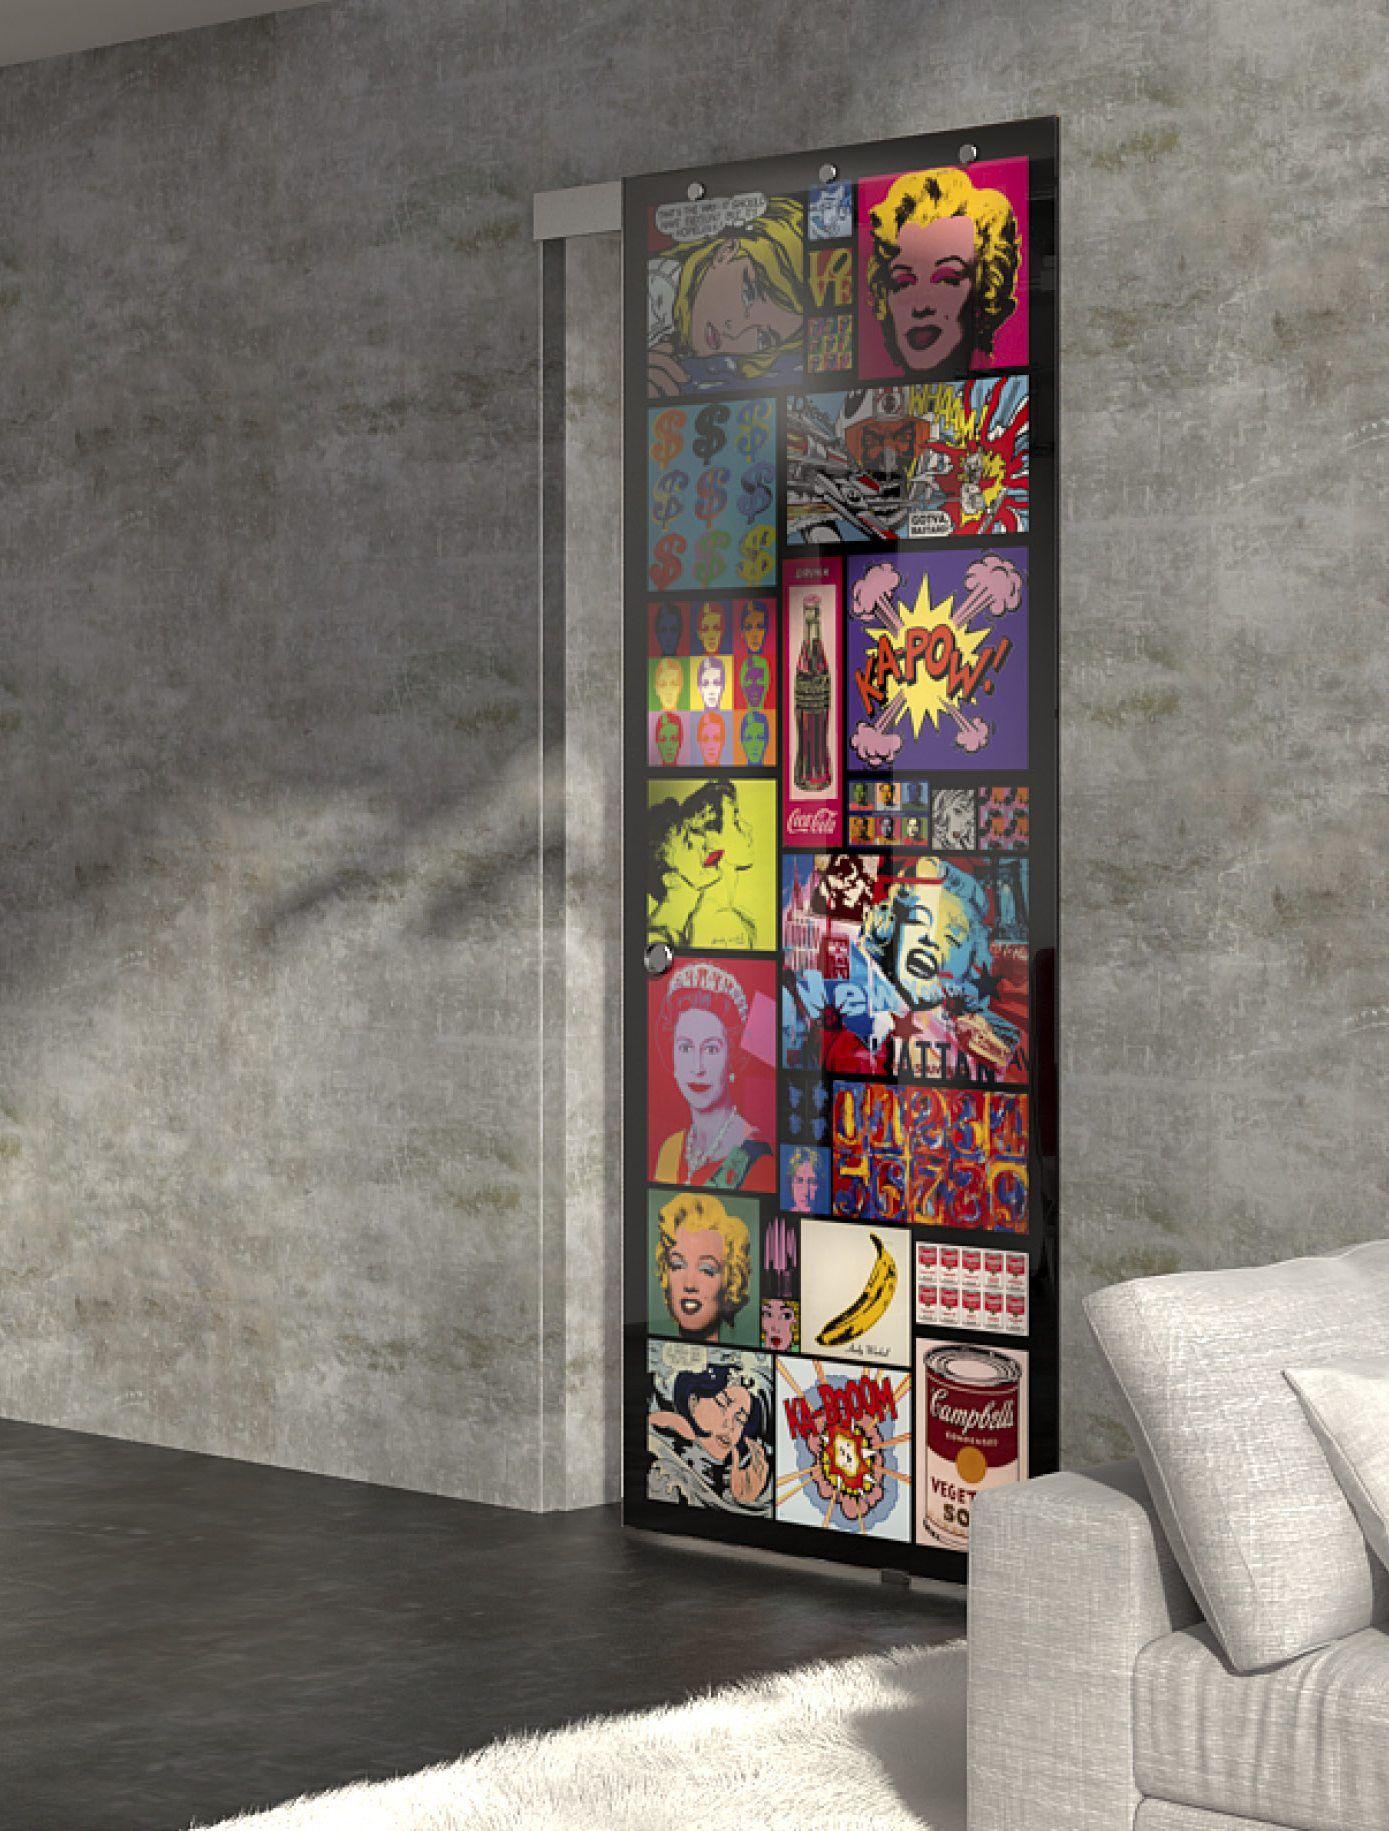 Sliding door glamour design glass interior design pop art